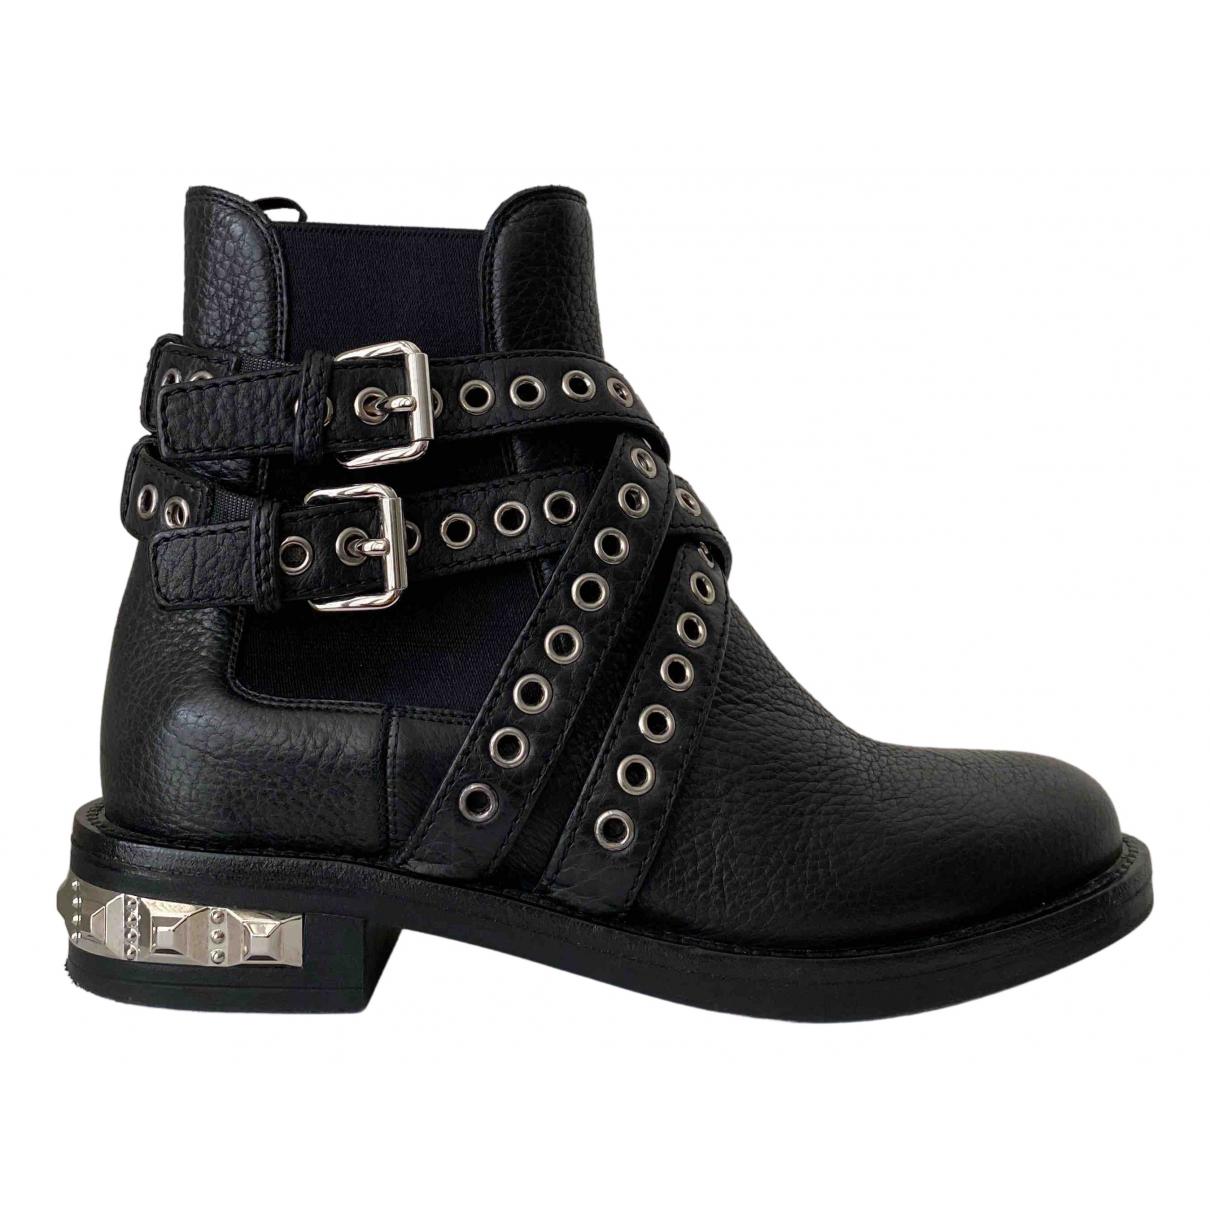 Miu Miu \N Black Leather Ankle boots for Women 37 EU